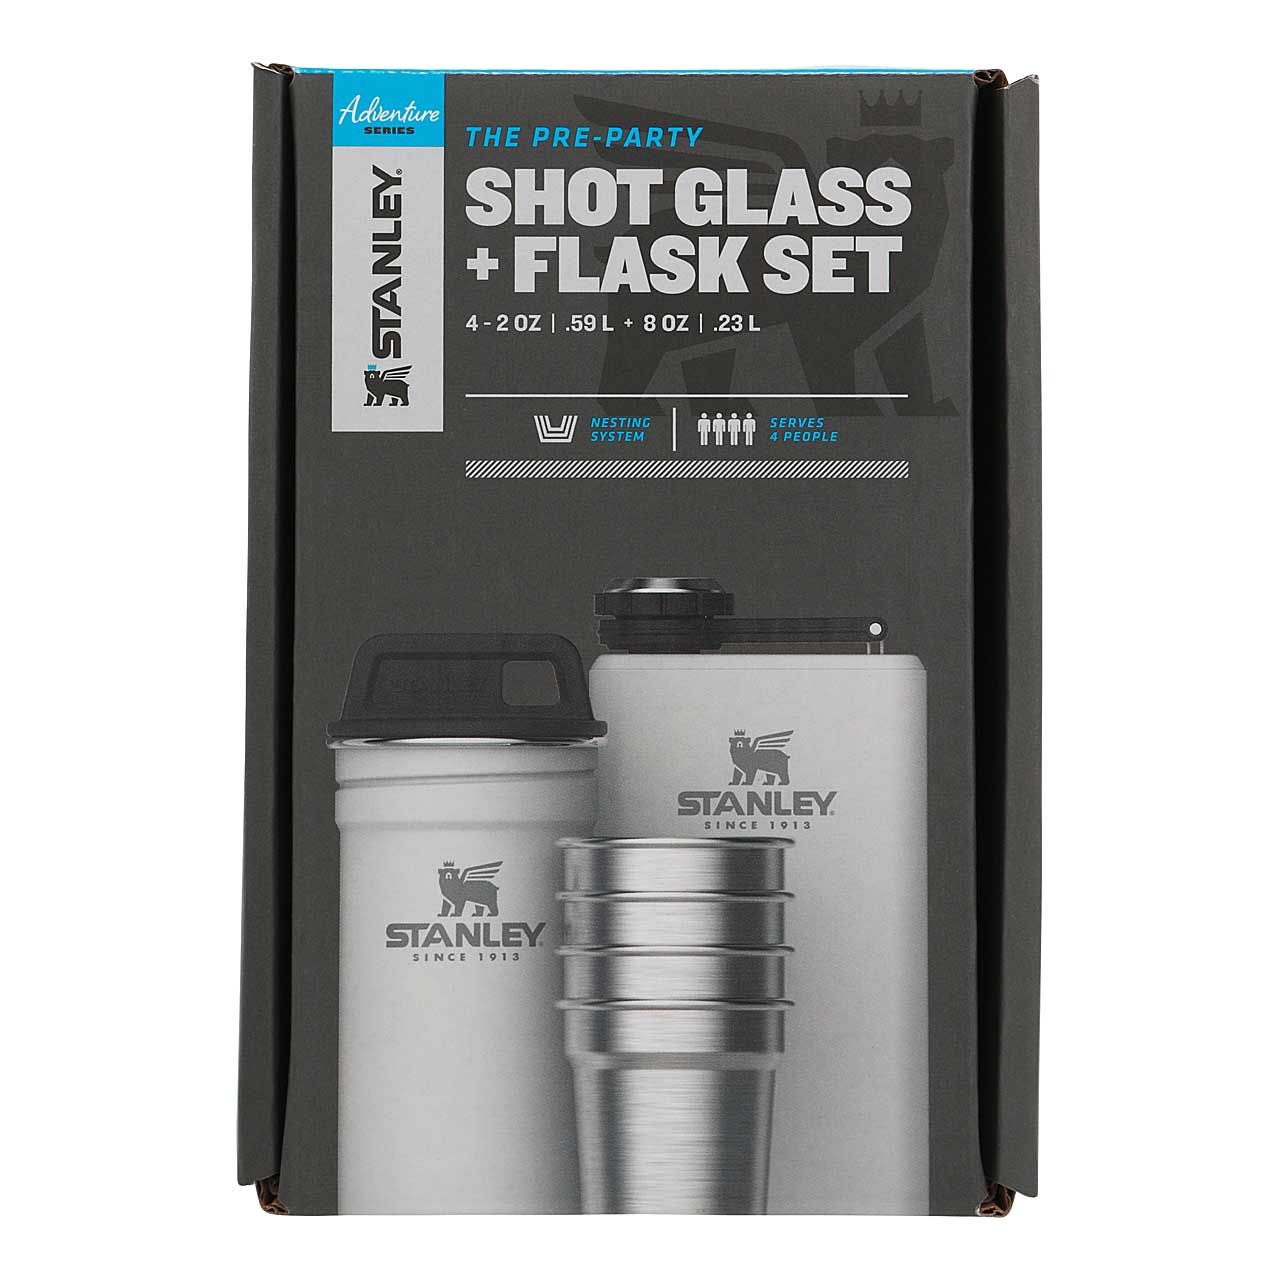 ADVENTURE SHOT & FLASK GIFT SET 236 ml